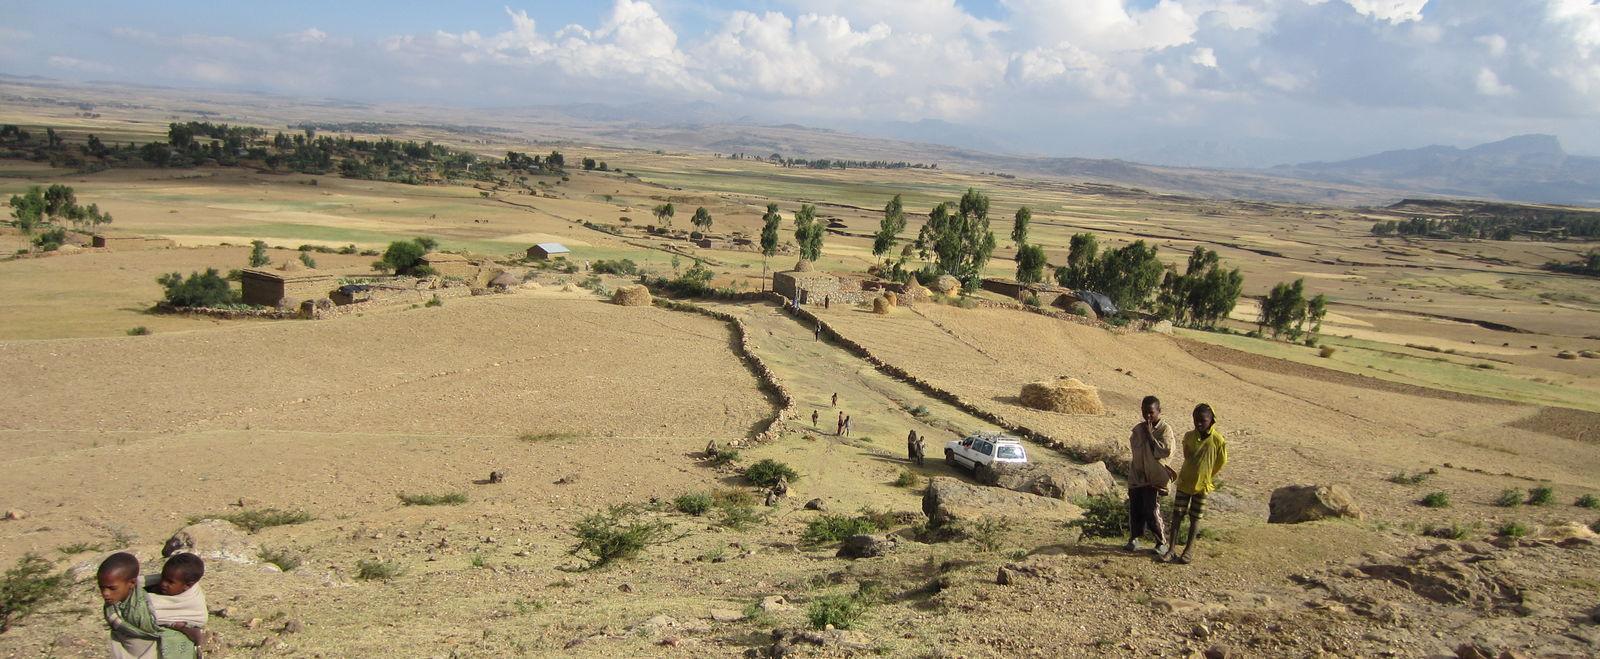 The Tigray region of Ethiopia.